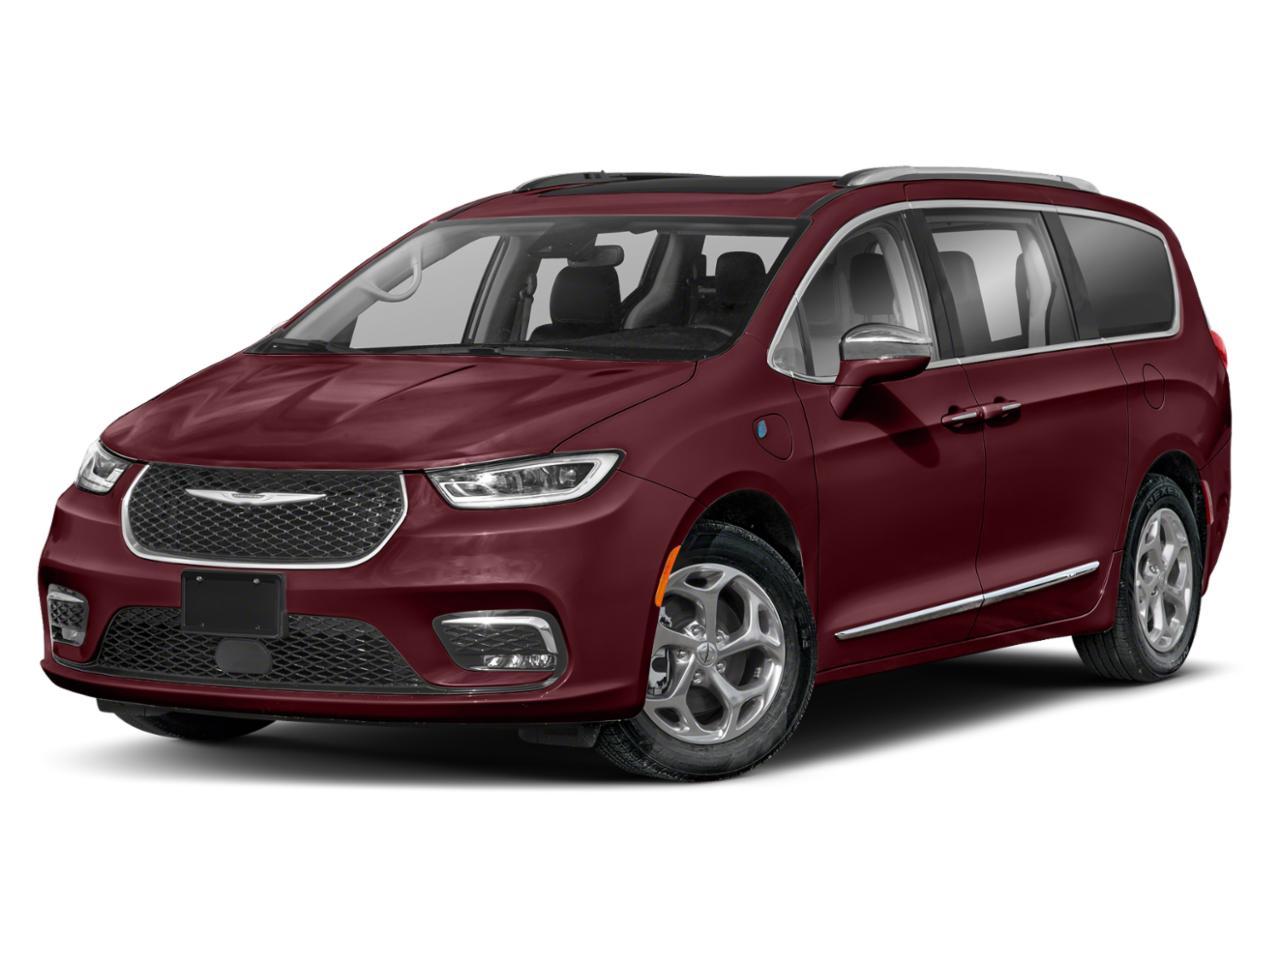 2021 Chrysler Pacifica Vehicle Photo in Oshkosh, WI 54901